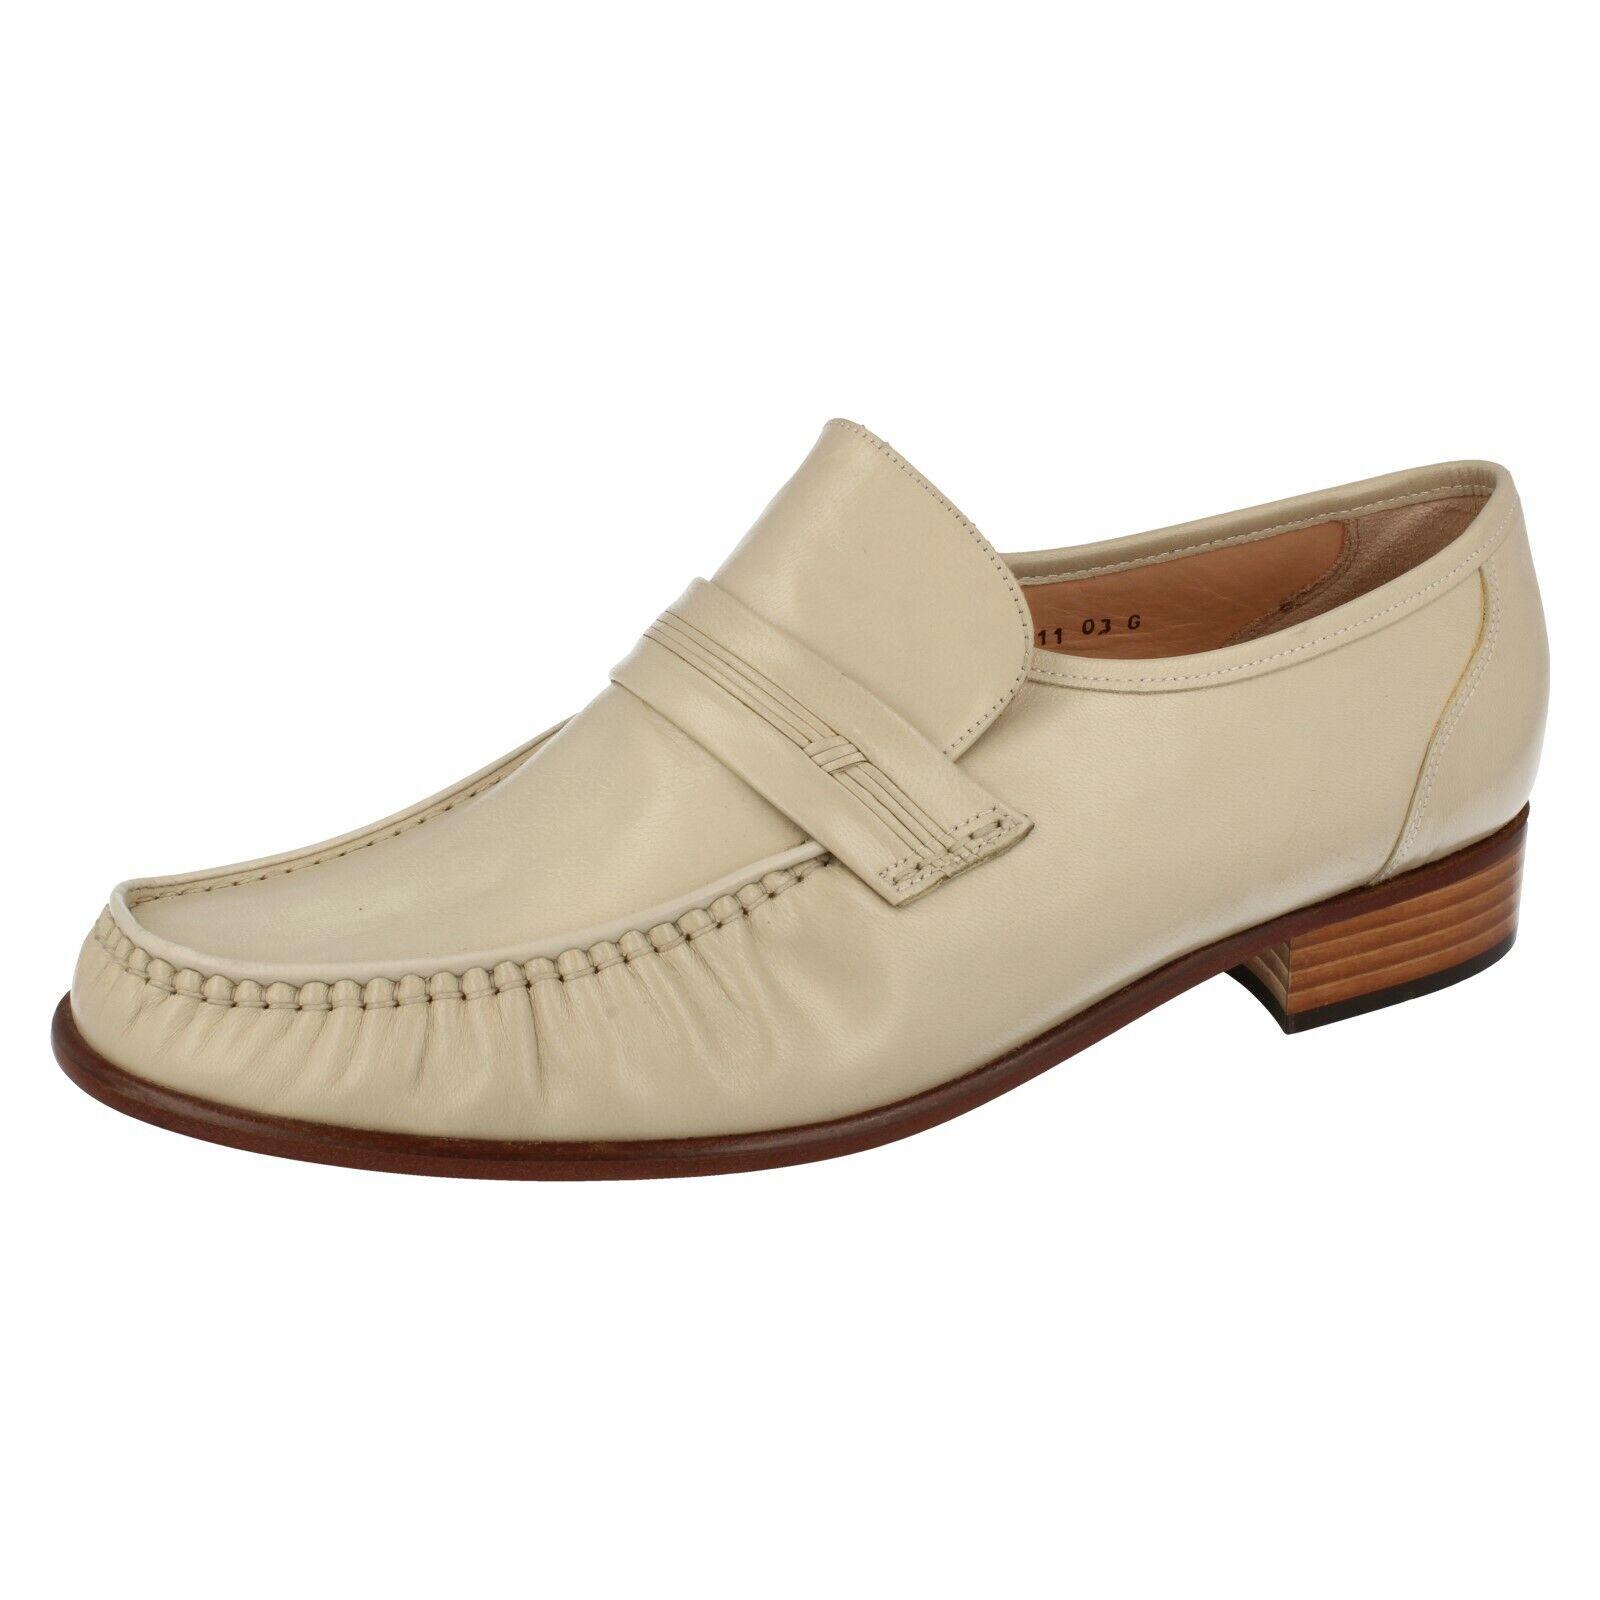 men Avorio in pelle da Infilare Grenson shoes Eleganti G Clapham (